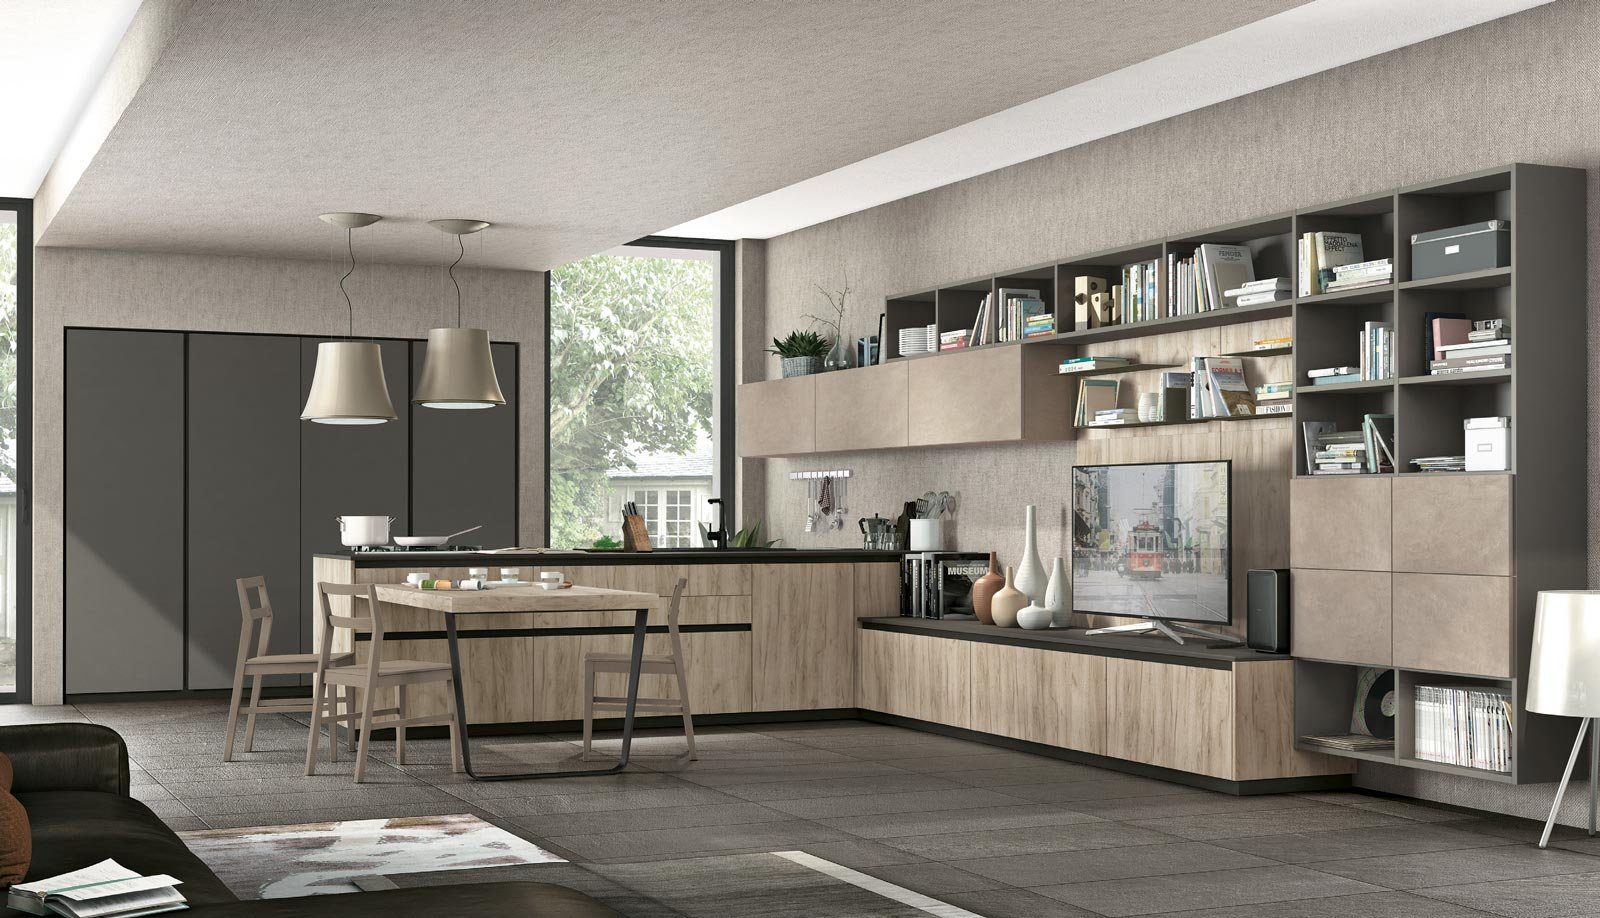 Eurocucina 2016 superfici soft touch per le nuove cucine - Cocinas caceres ...